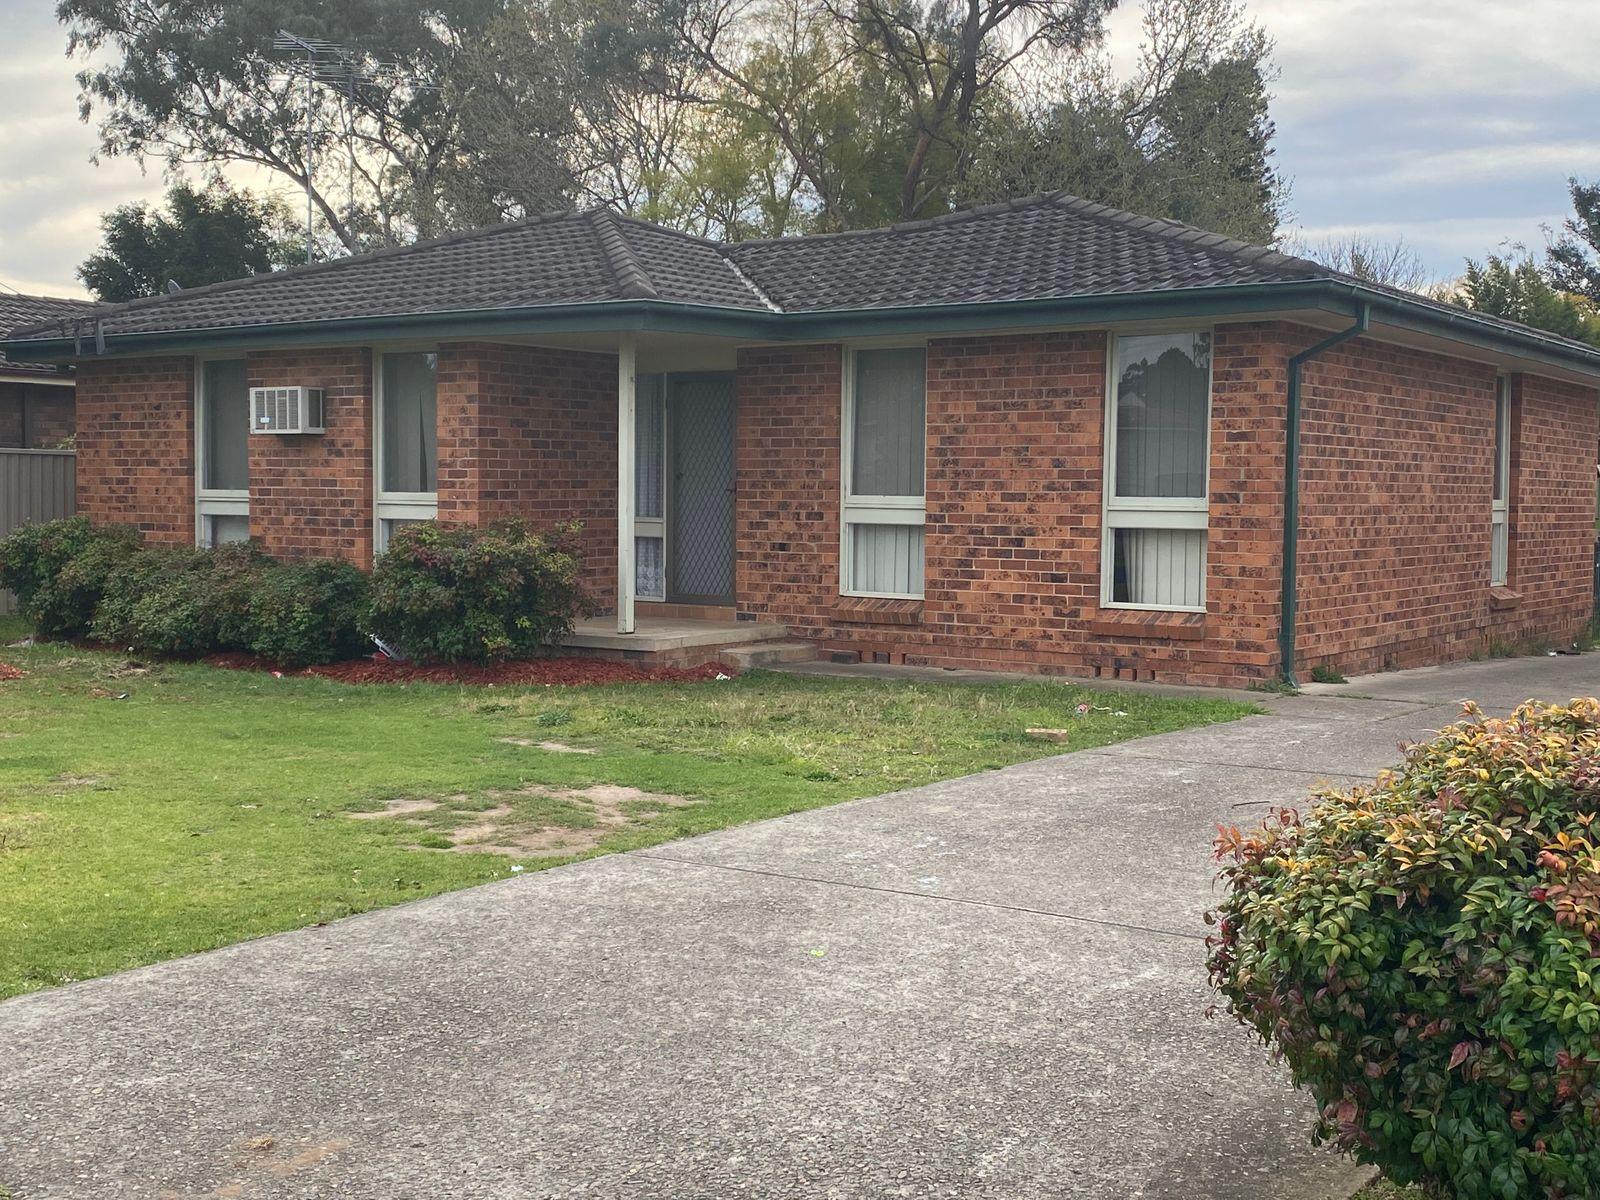 46 Holborrow Avenue, Hobartville, NSW 2753